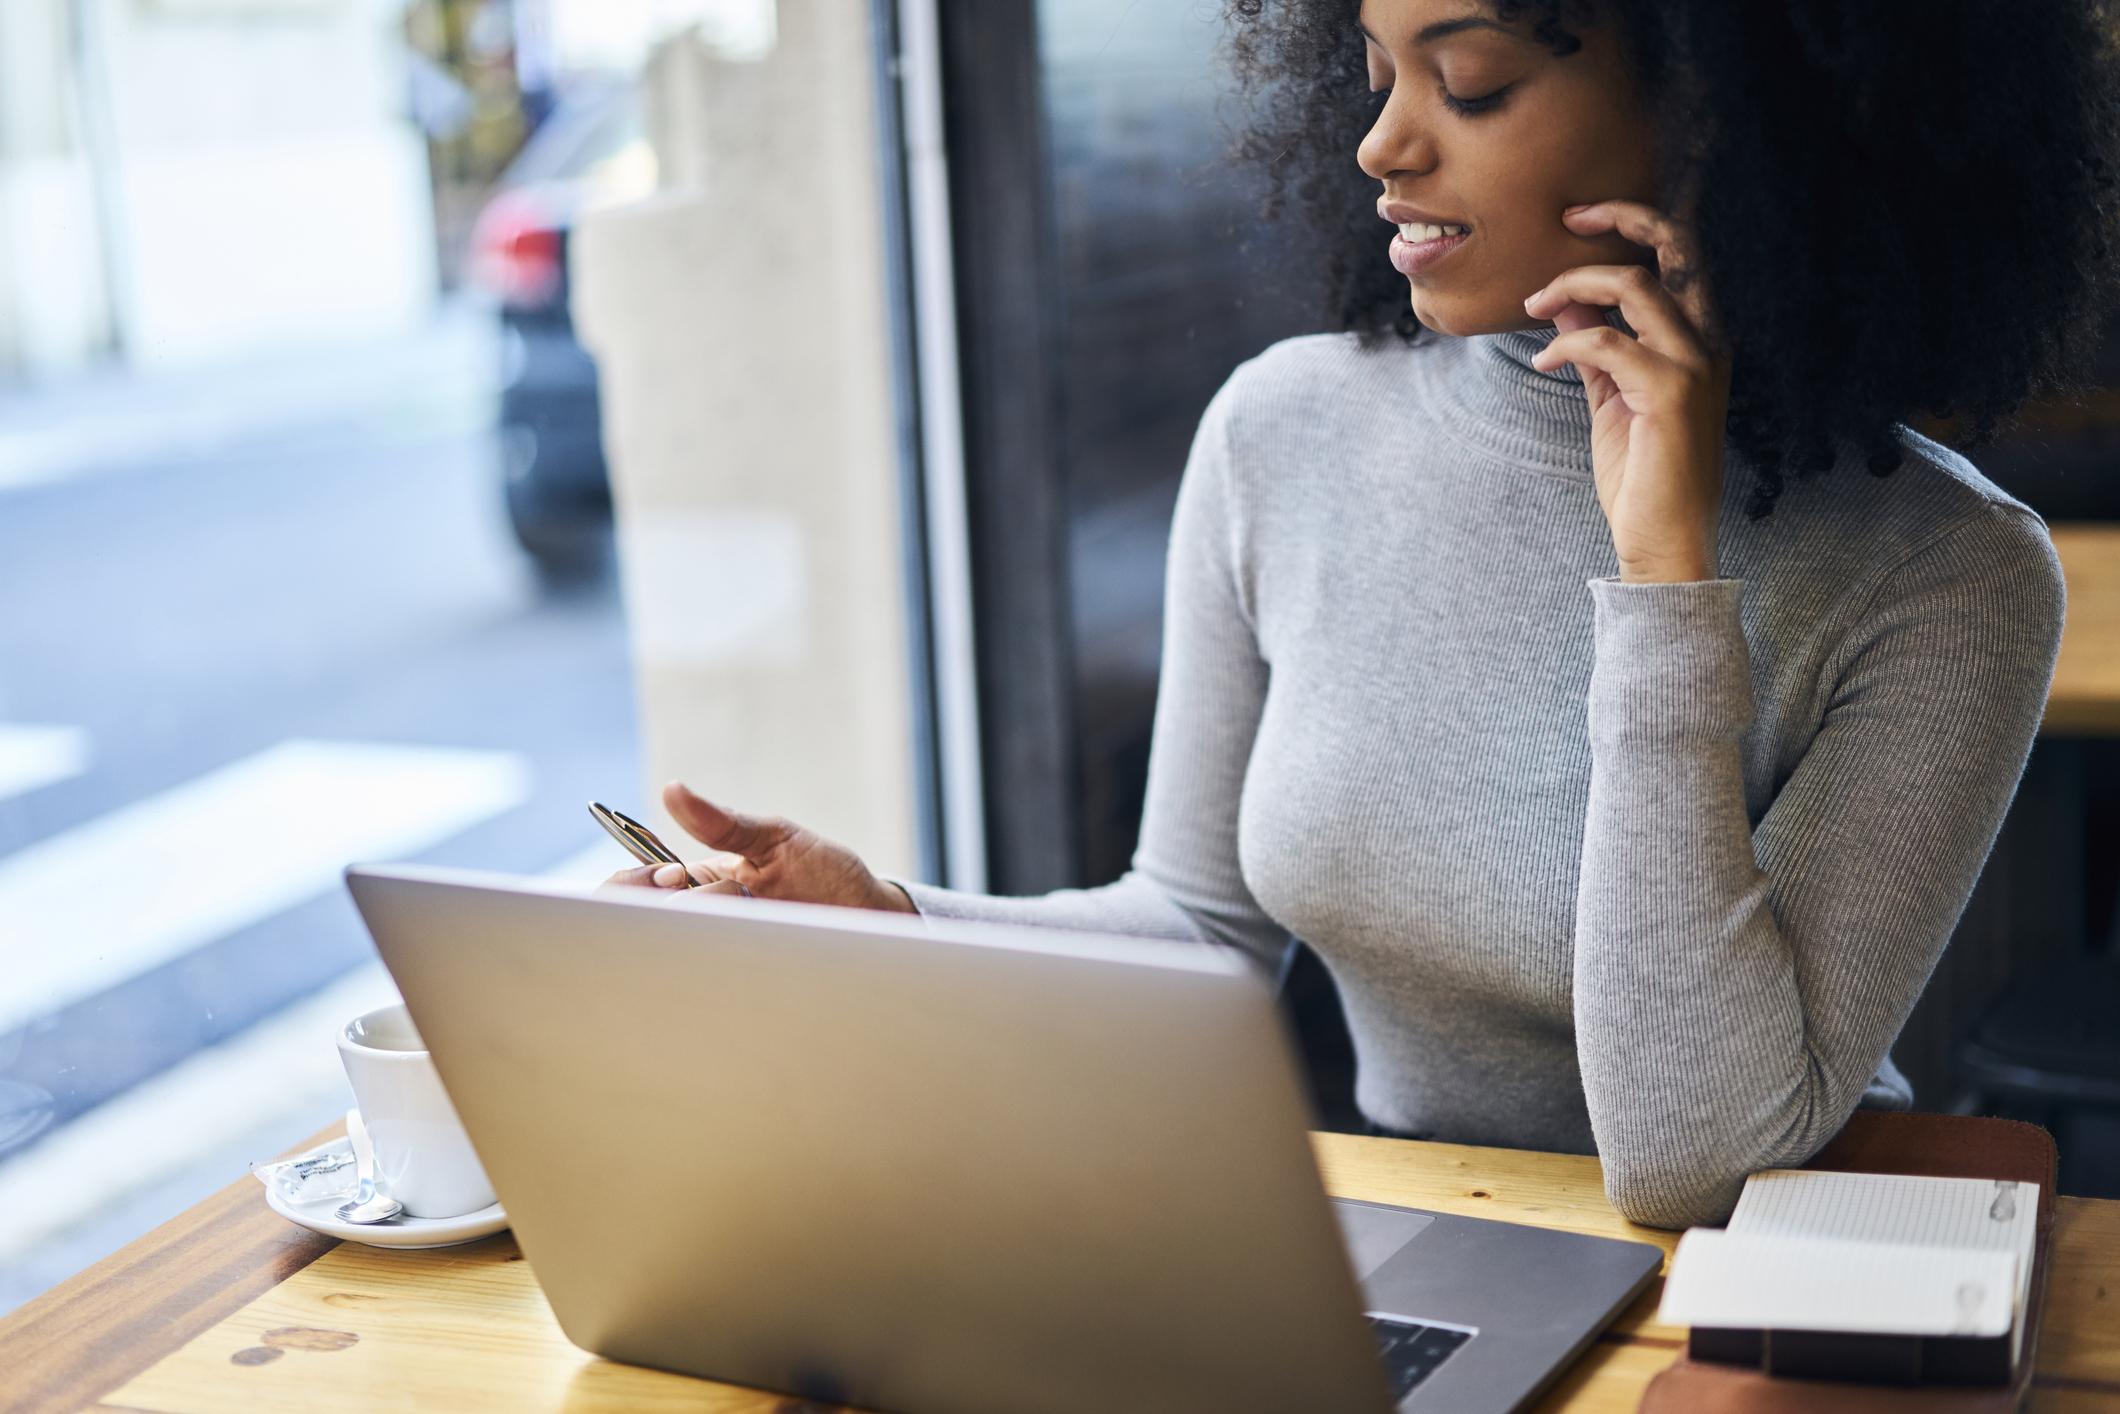 Woman at a laptop near a window